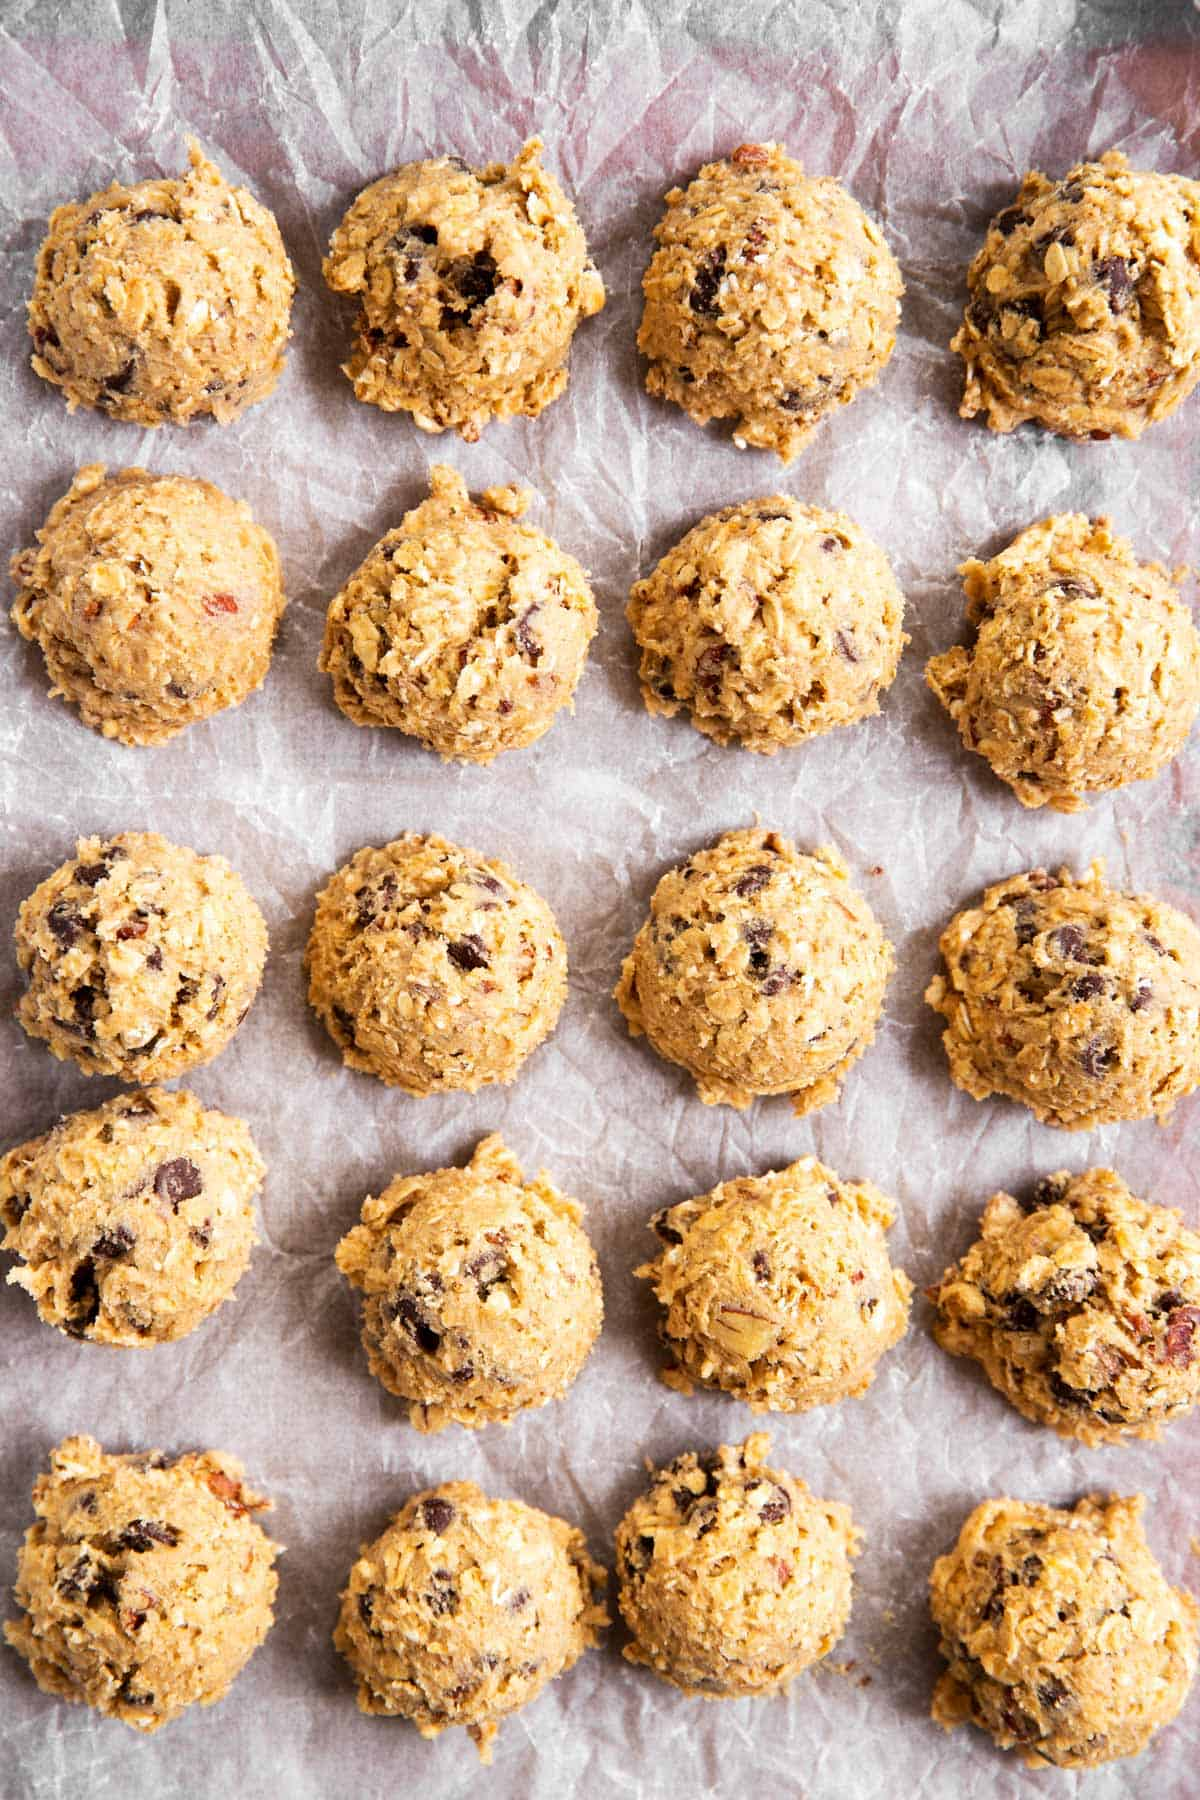 twenty oatmeal chocolate chip cookie dough balls on lined baking sheet